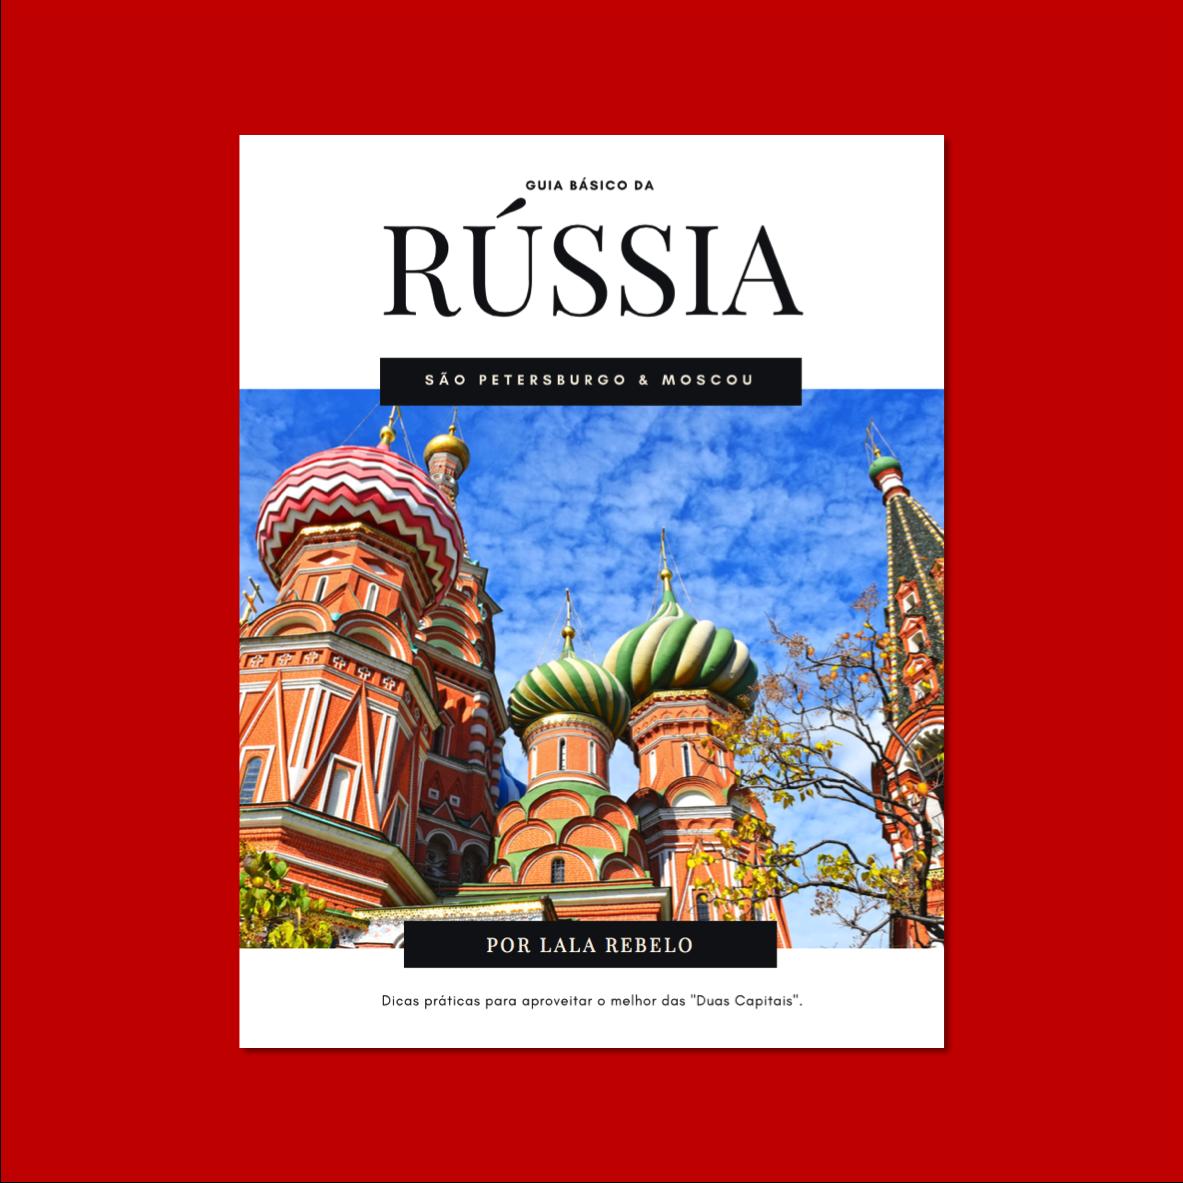 guia da russia lala rebelo